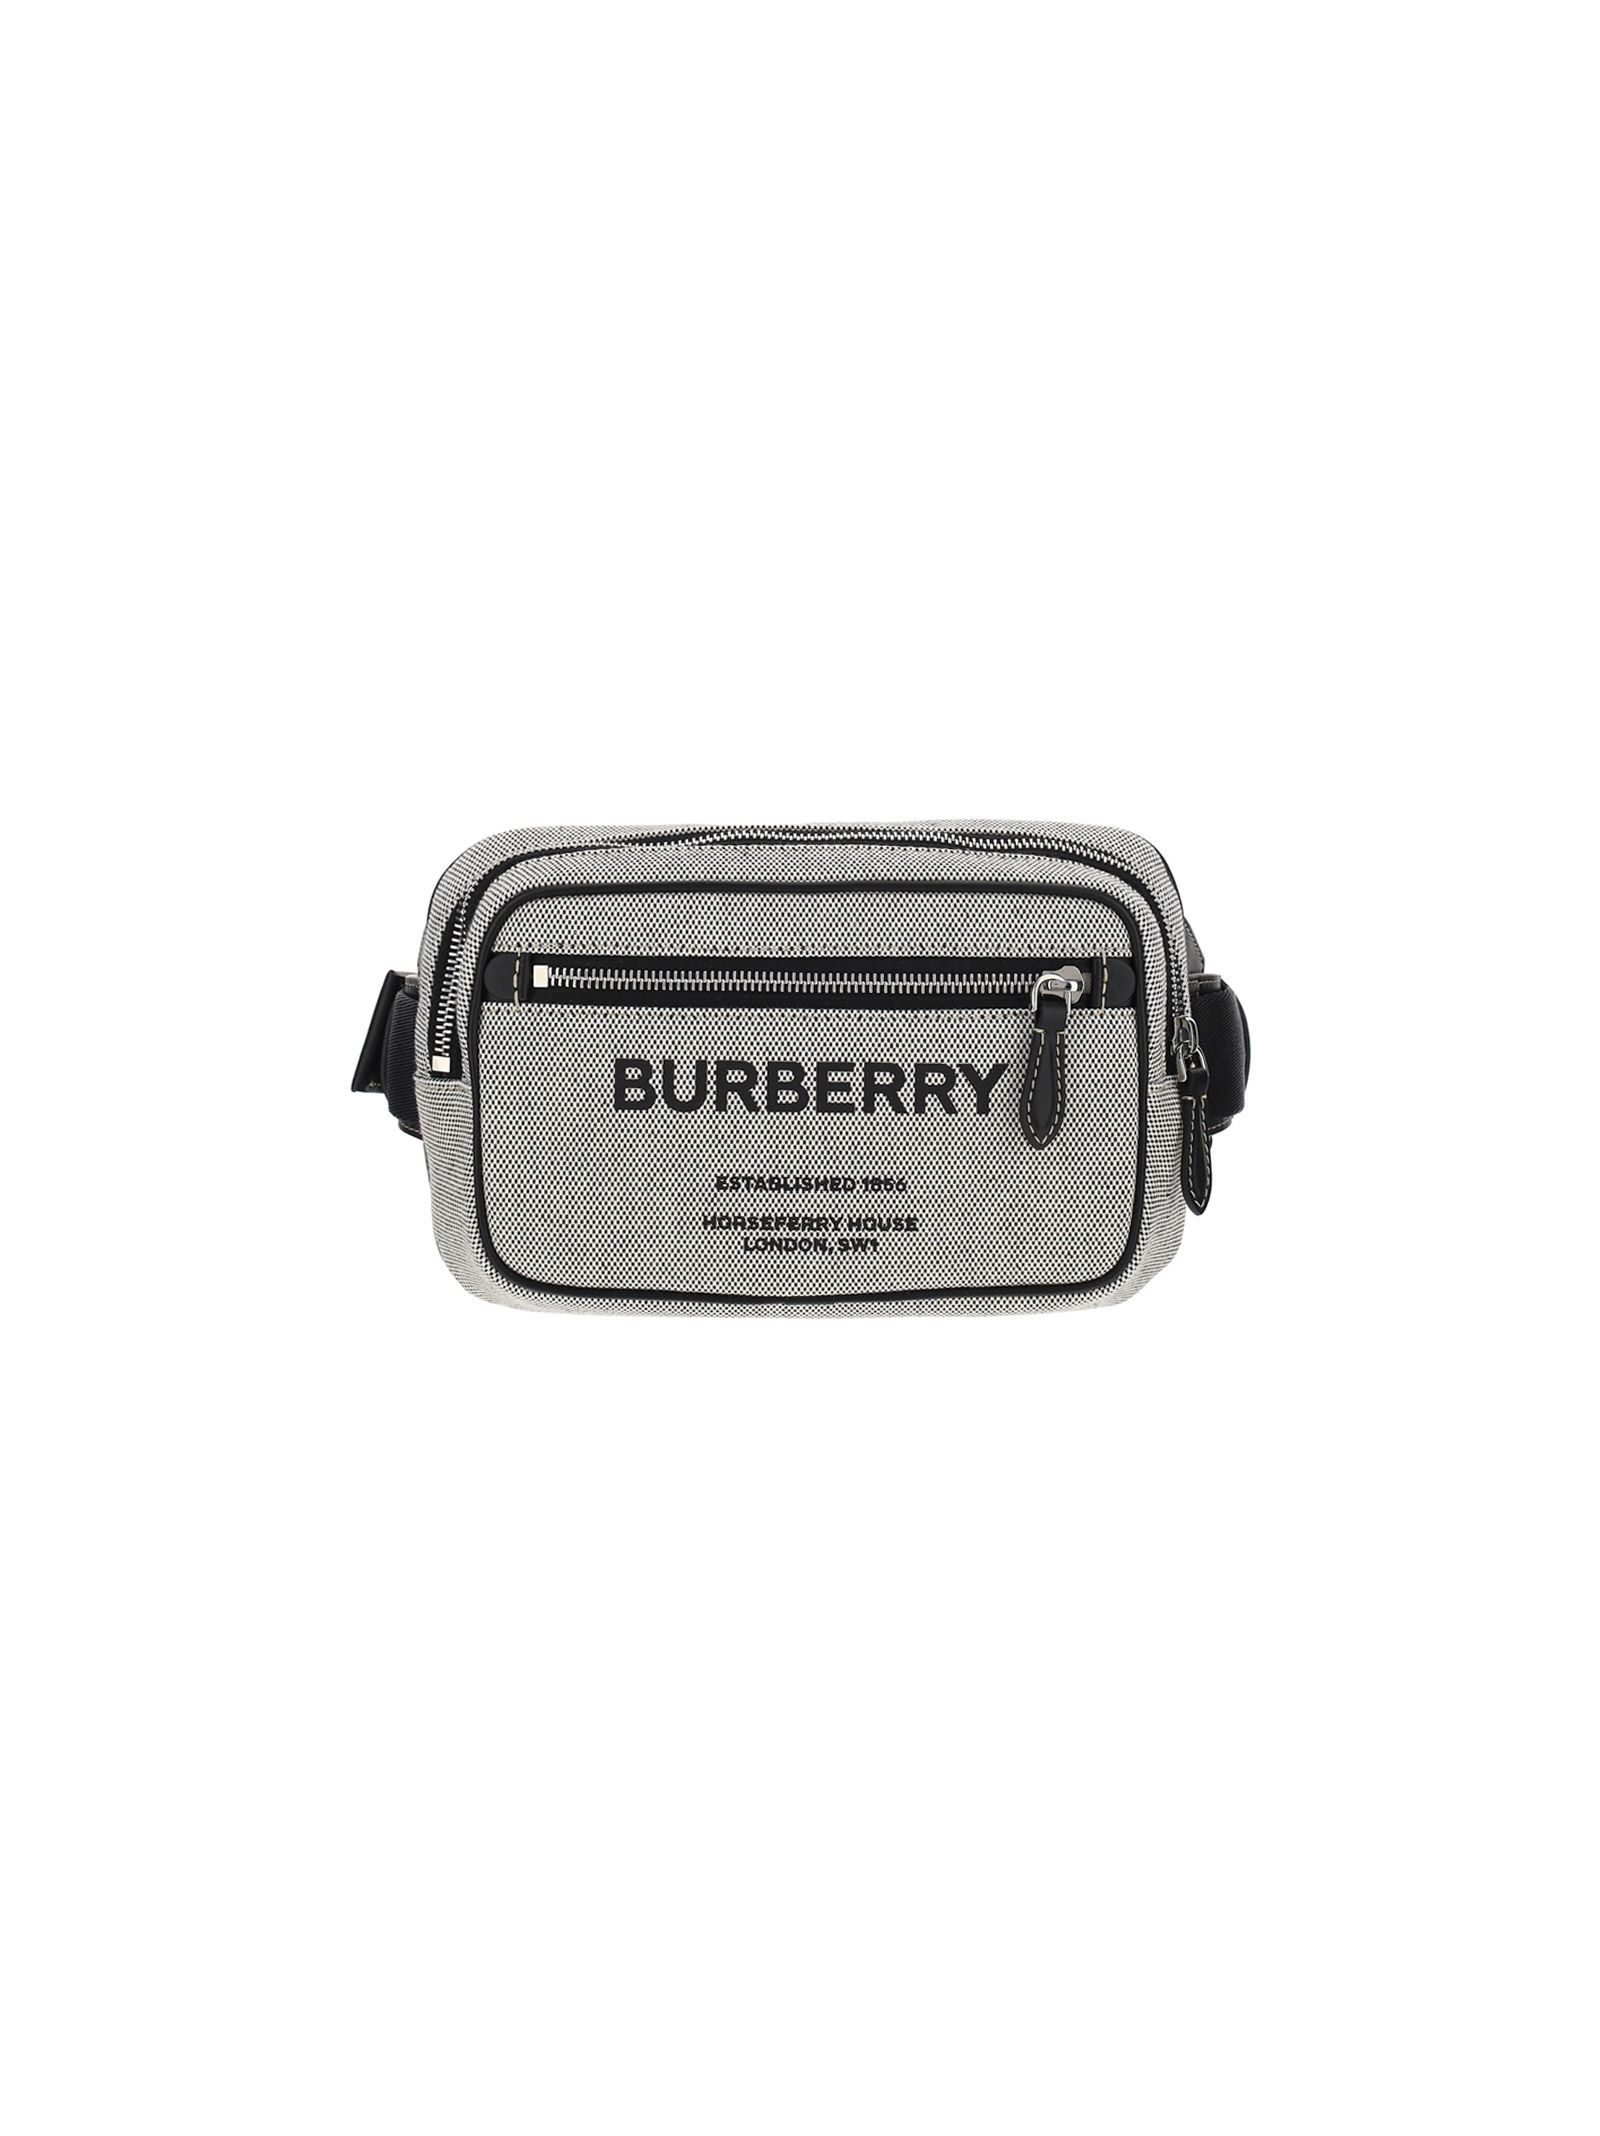 Burberry Belts BURBERRY MEN'S BLACK OTHER MATERIALS BELT BAG